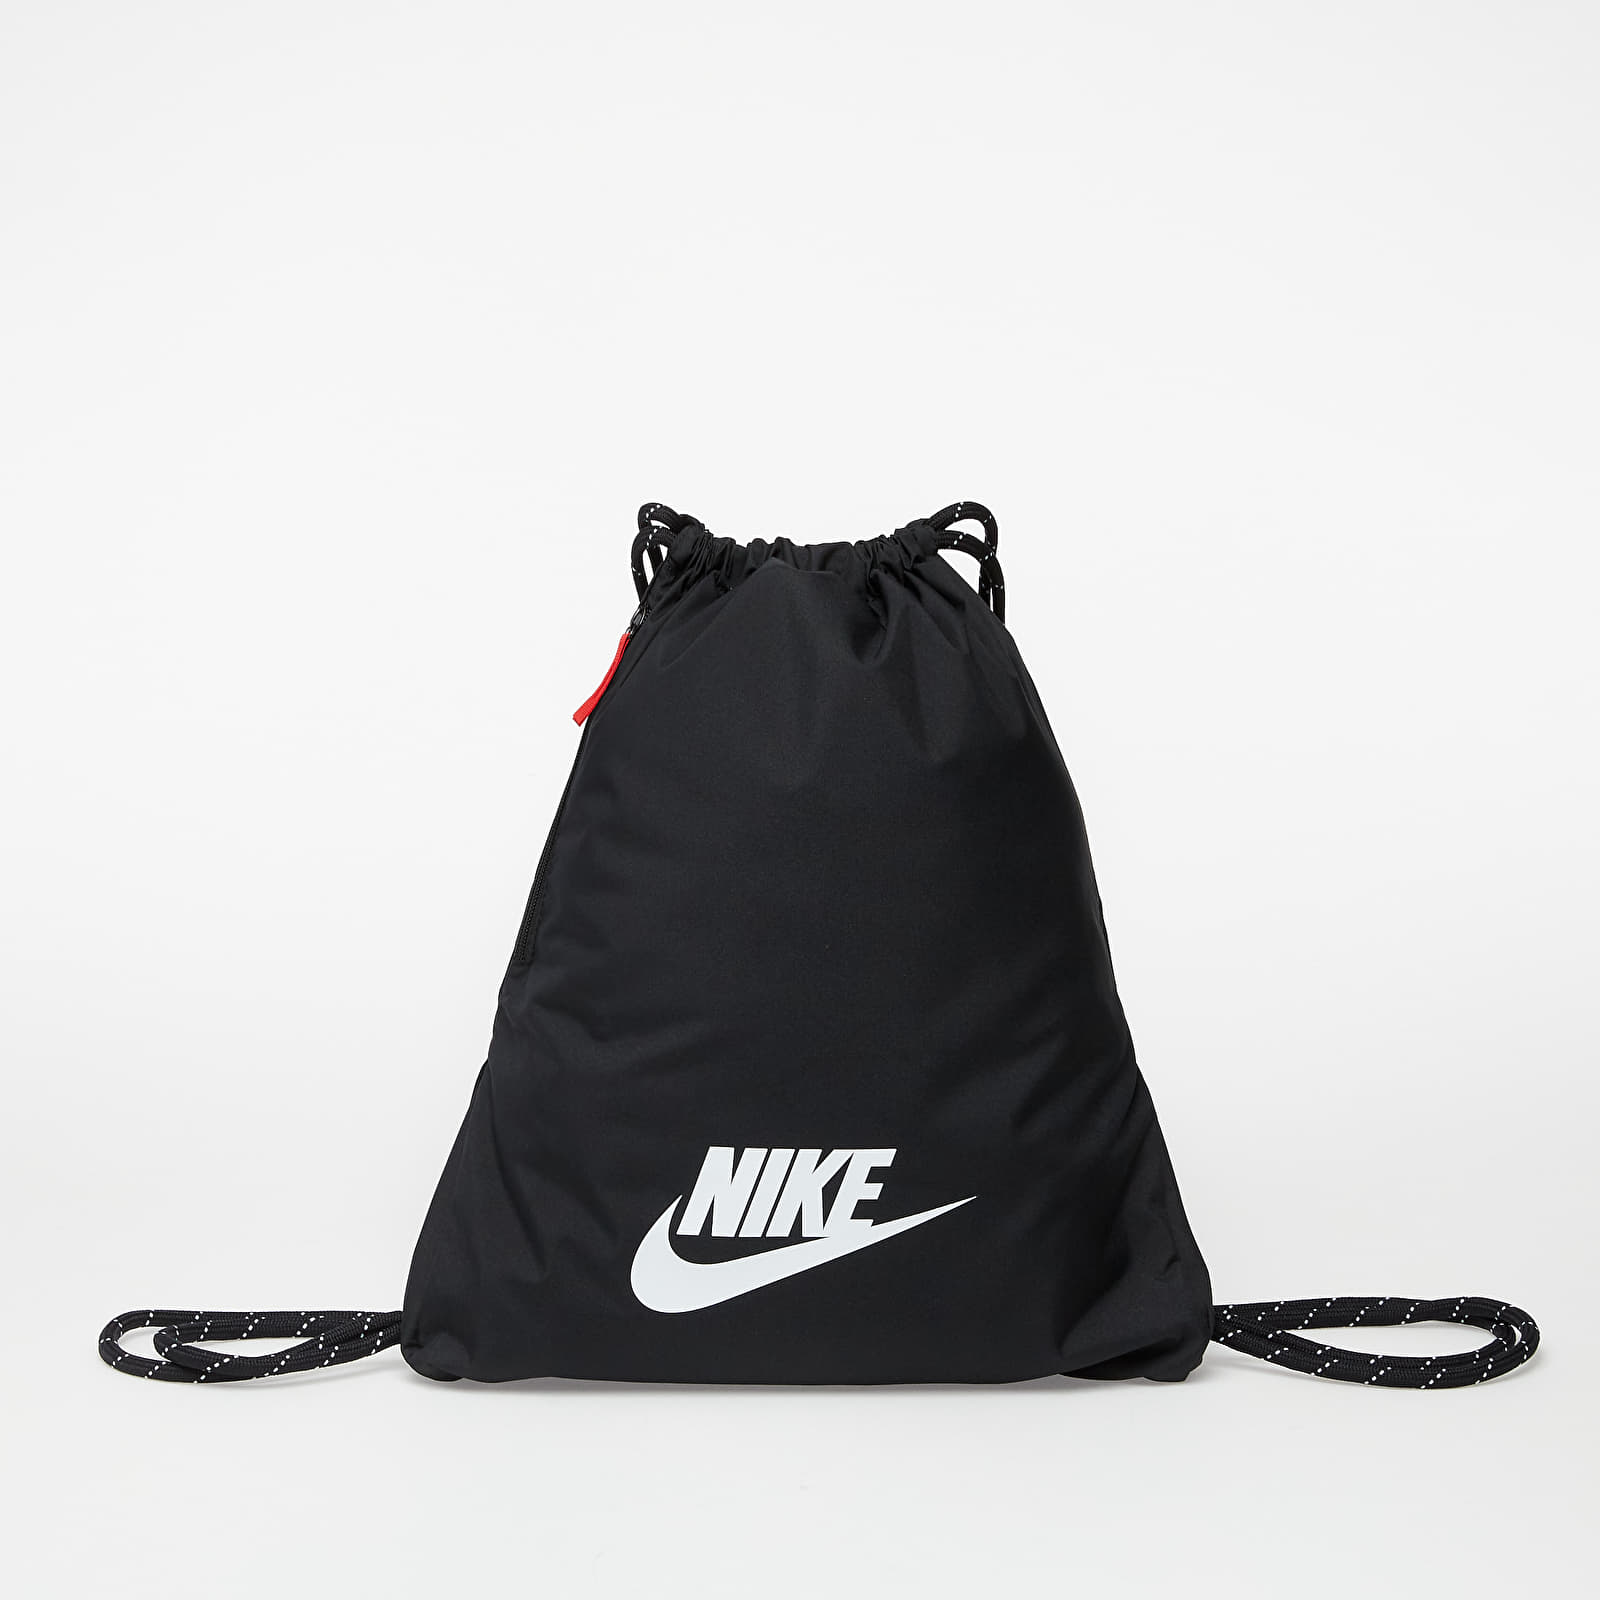 Gymsacks Nike Heritage Gymsack Black/ Black/ White